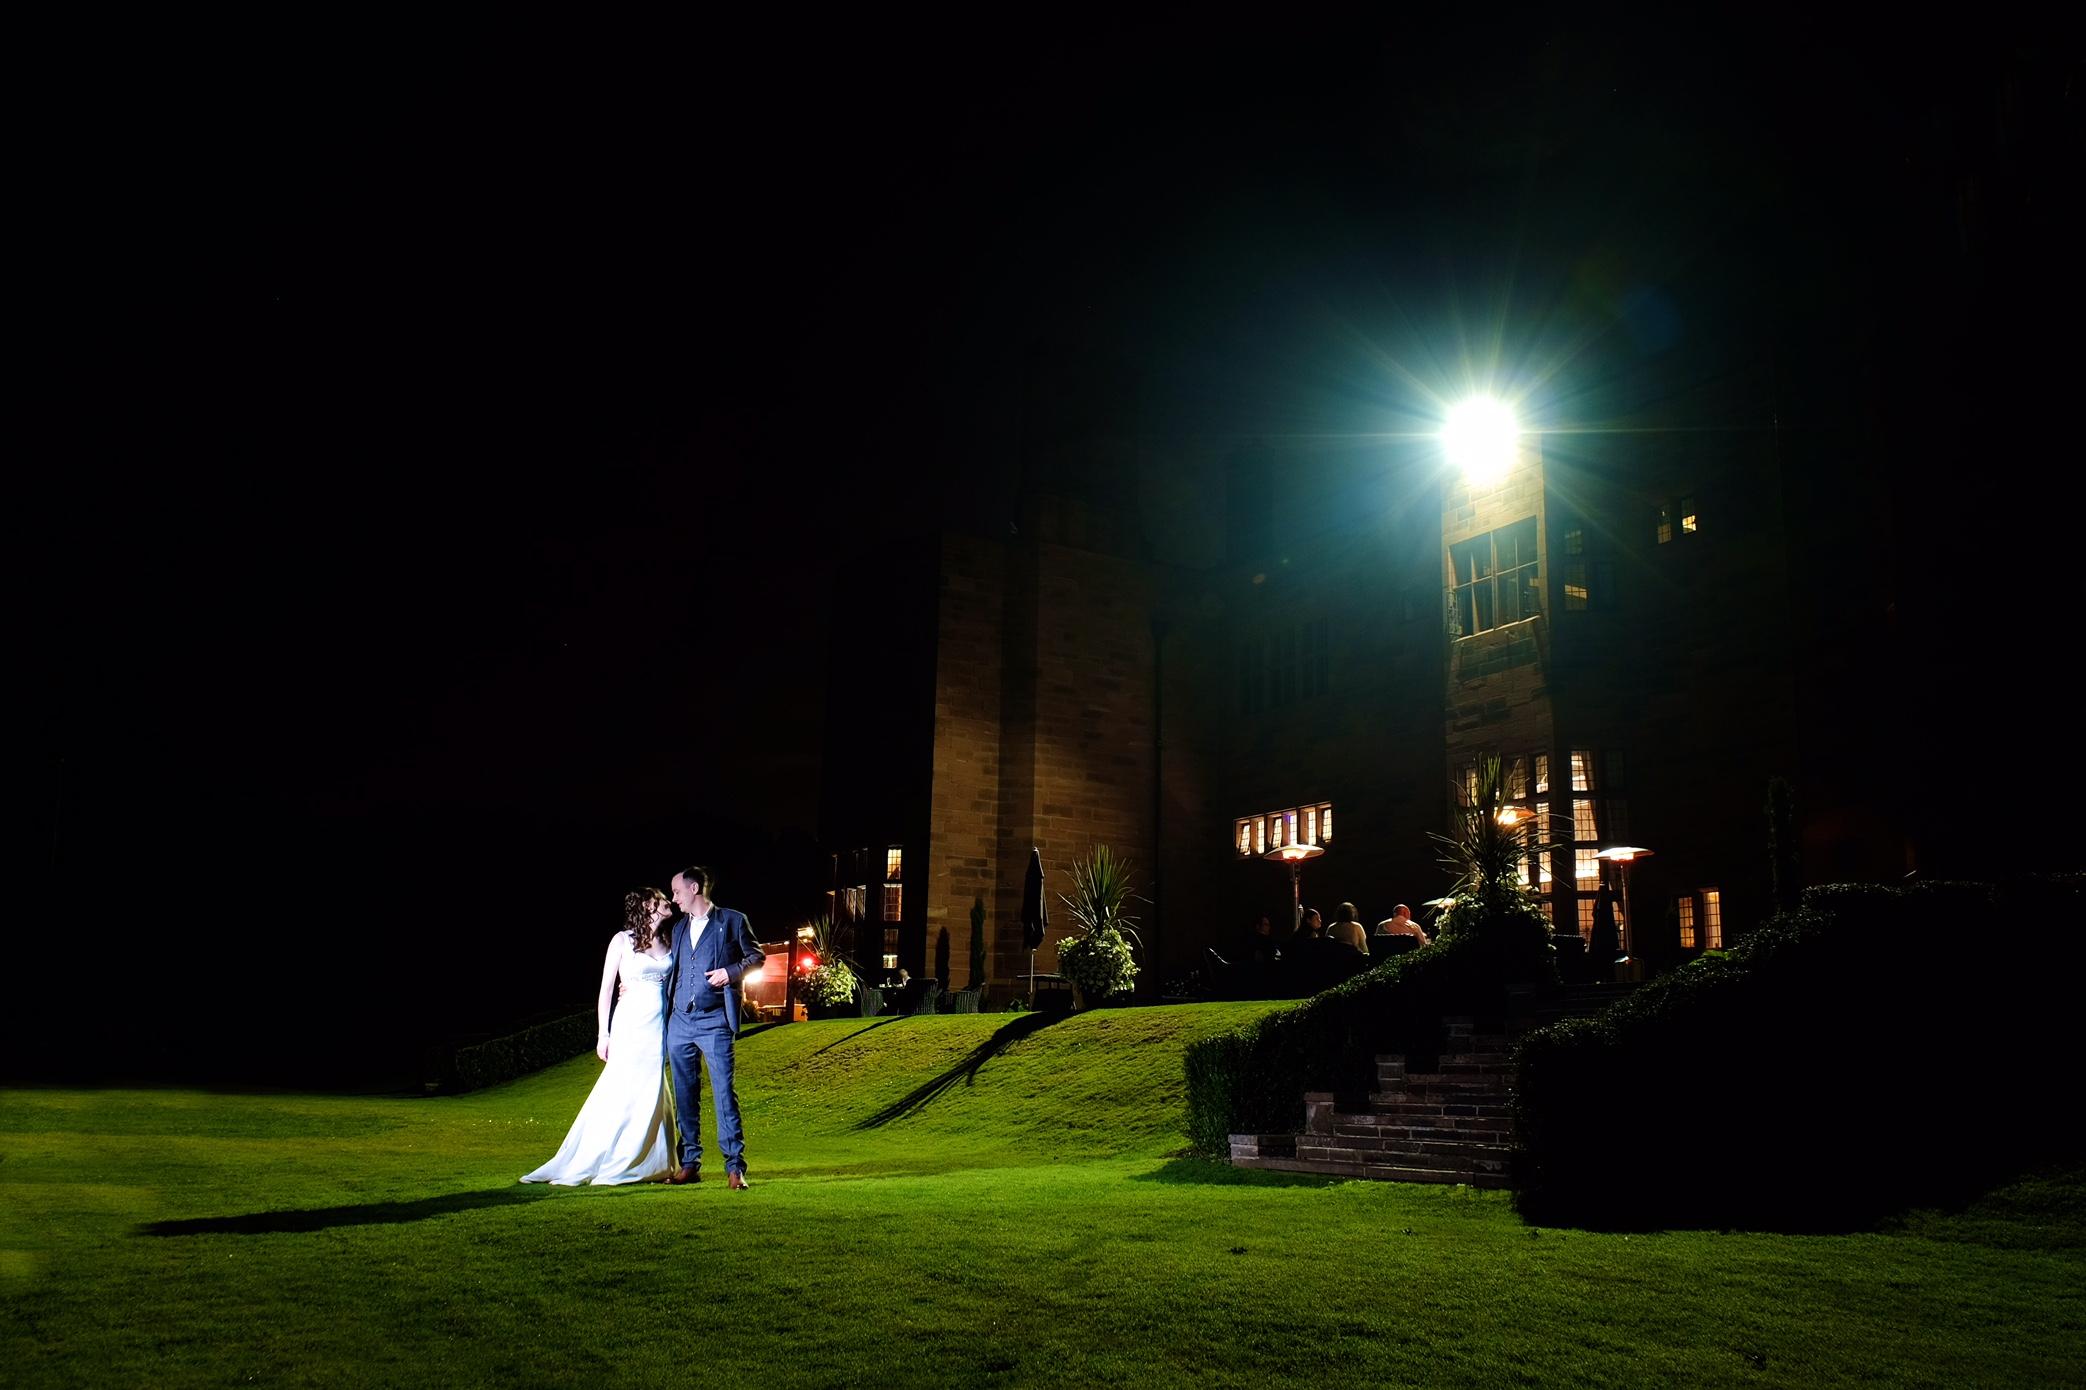 Wedding couple at night under spot light